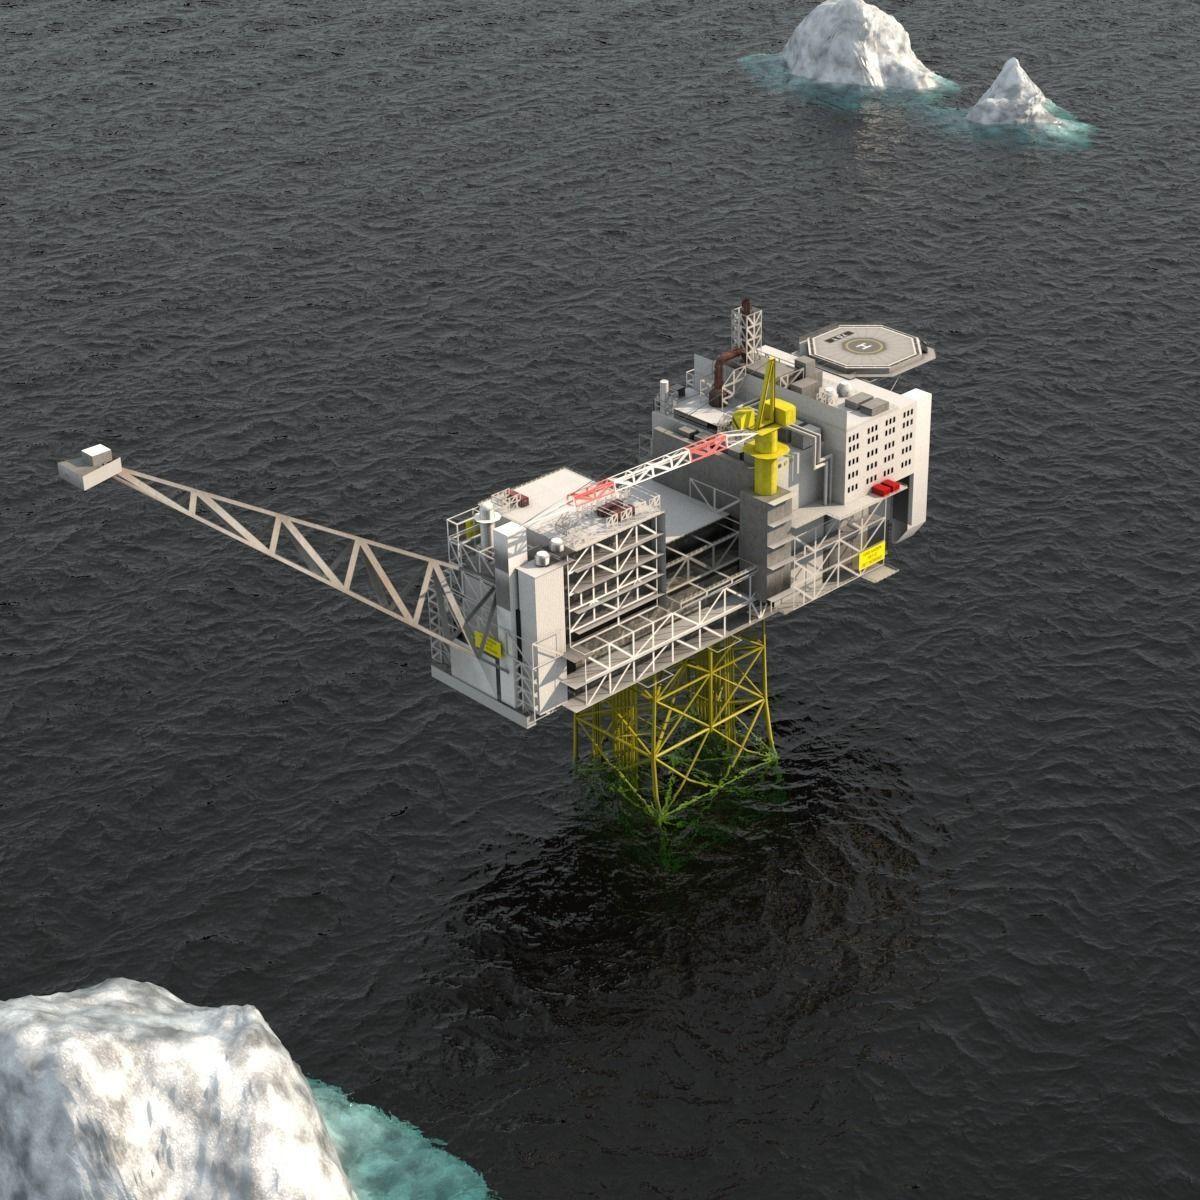 Ivar Aasen Offshore Oil platform